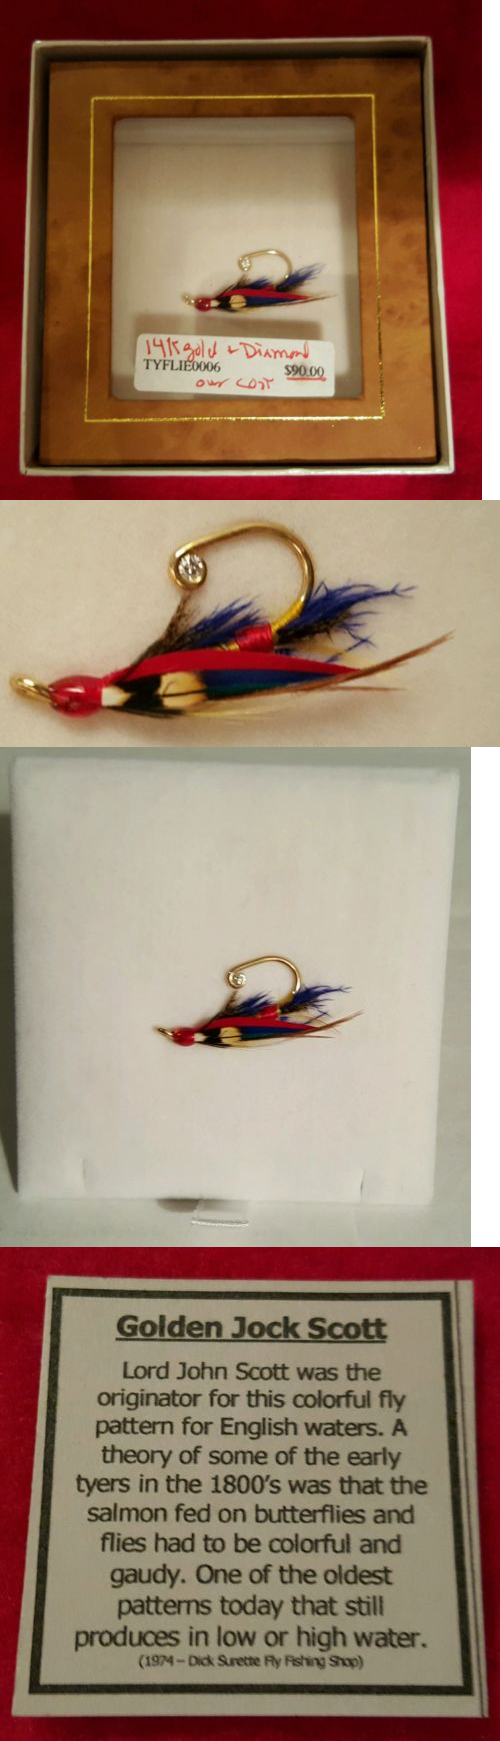 Lapel Pins 60115: Rare Tyflied 14K Gold And Diamond Golden Jock Scott Lapel Pin BUY IT NOW ONLY: $149.99